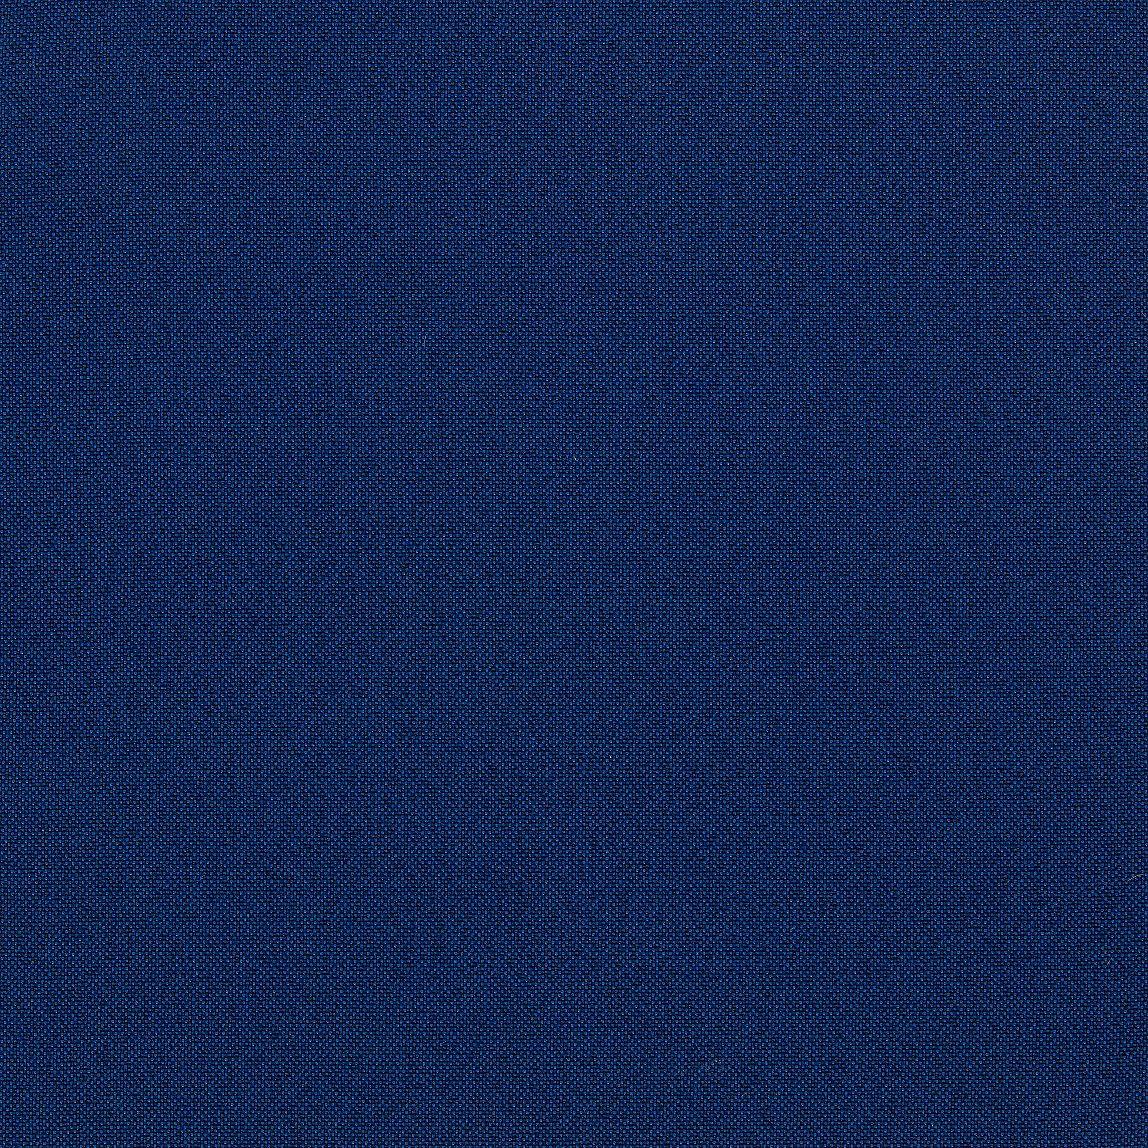 Meld Mariner Swatch